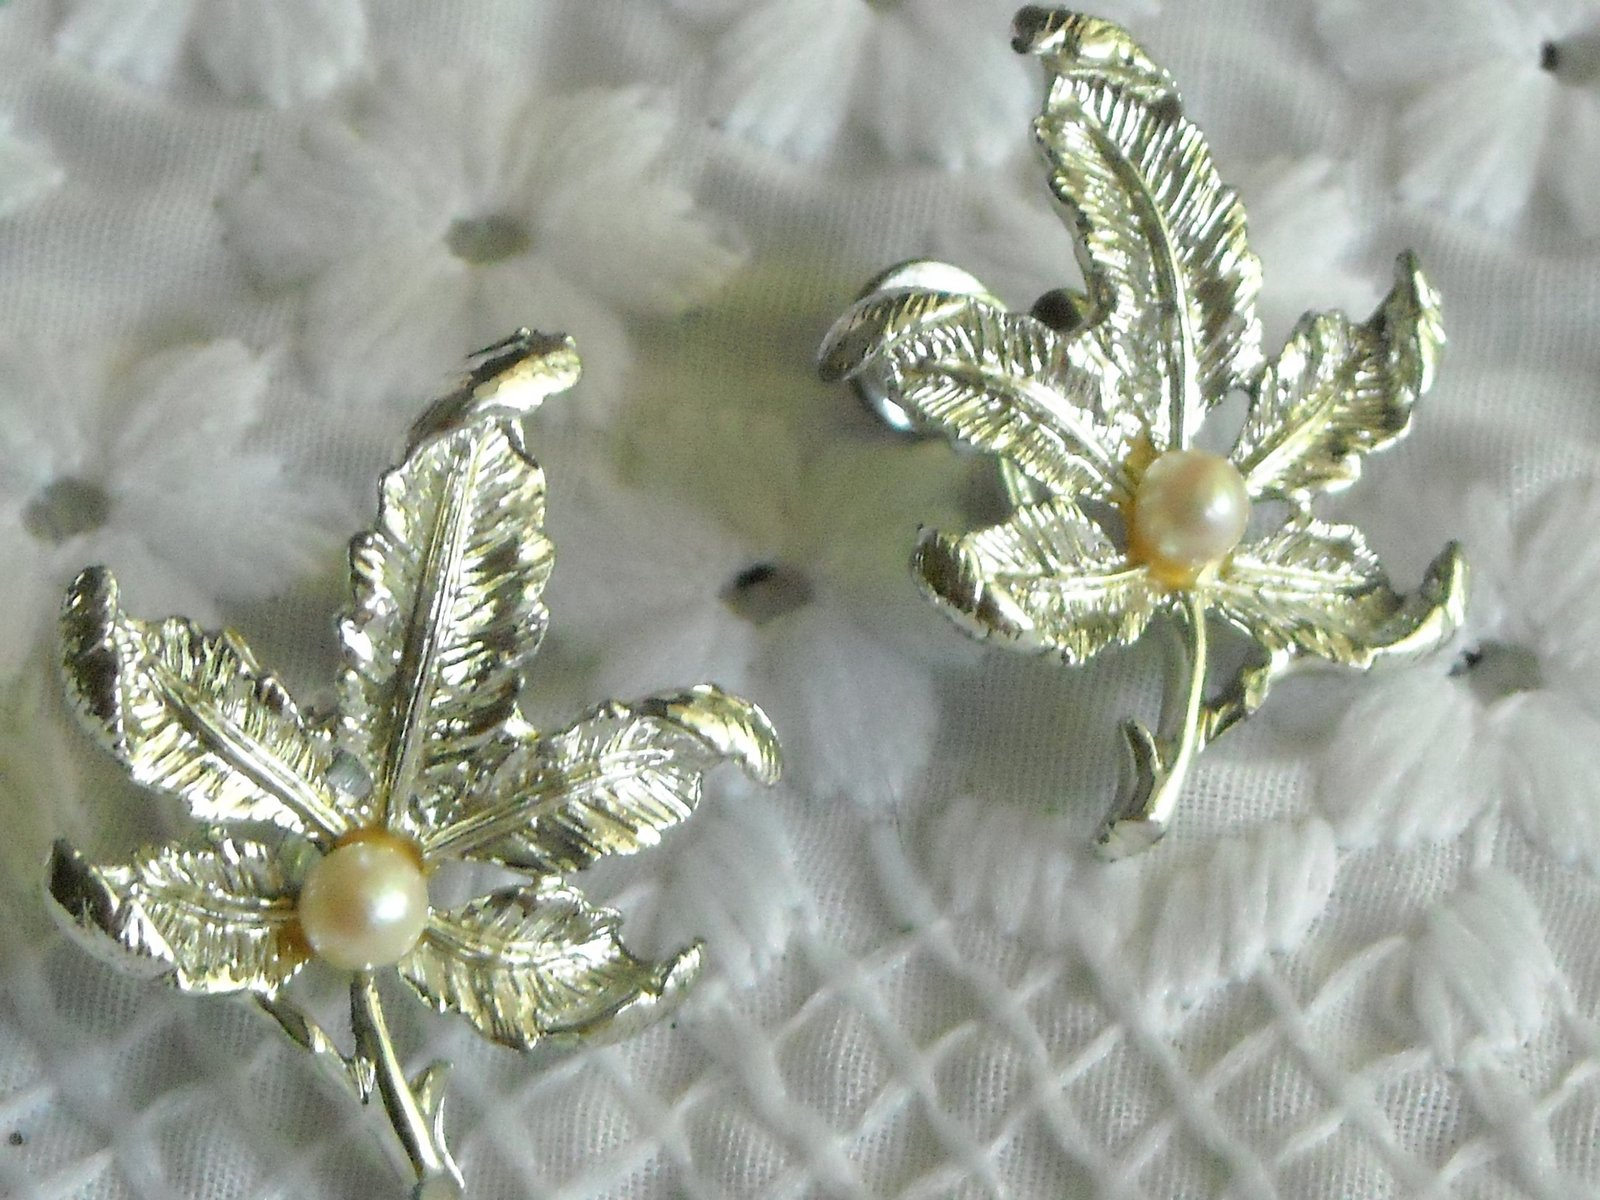 Vintage Maple Leaf Faux Ivory Pearl Screw Back Earrings Shiny Silver Tone image 2